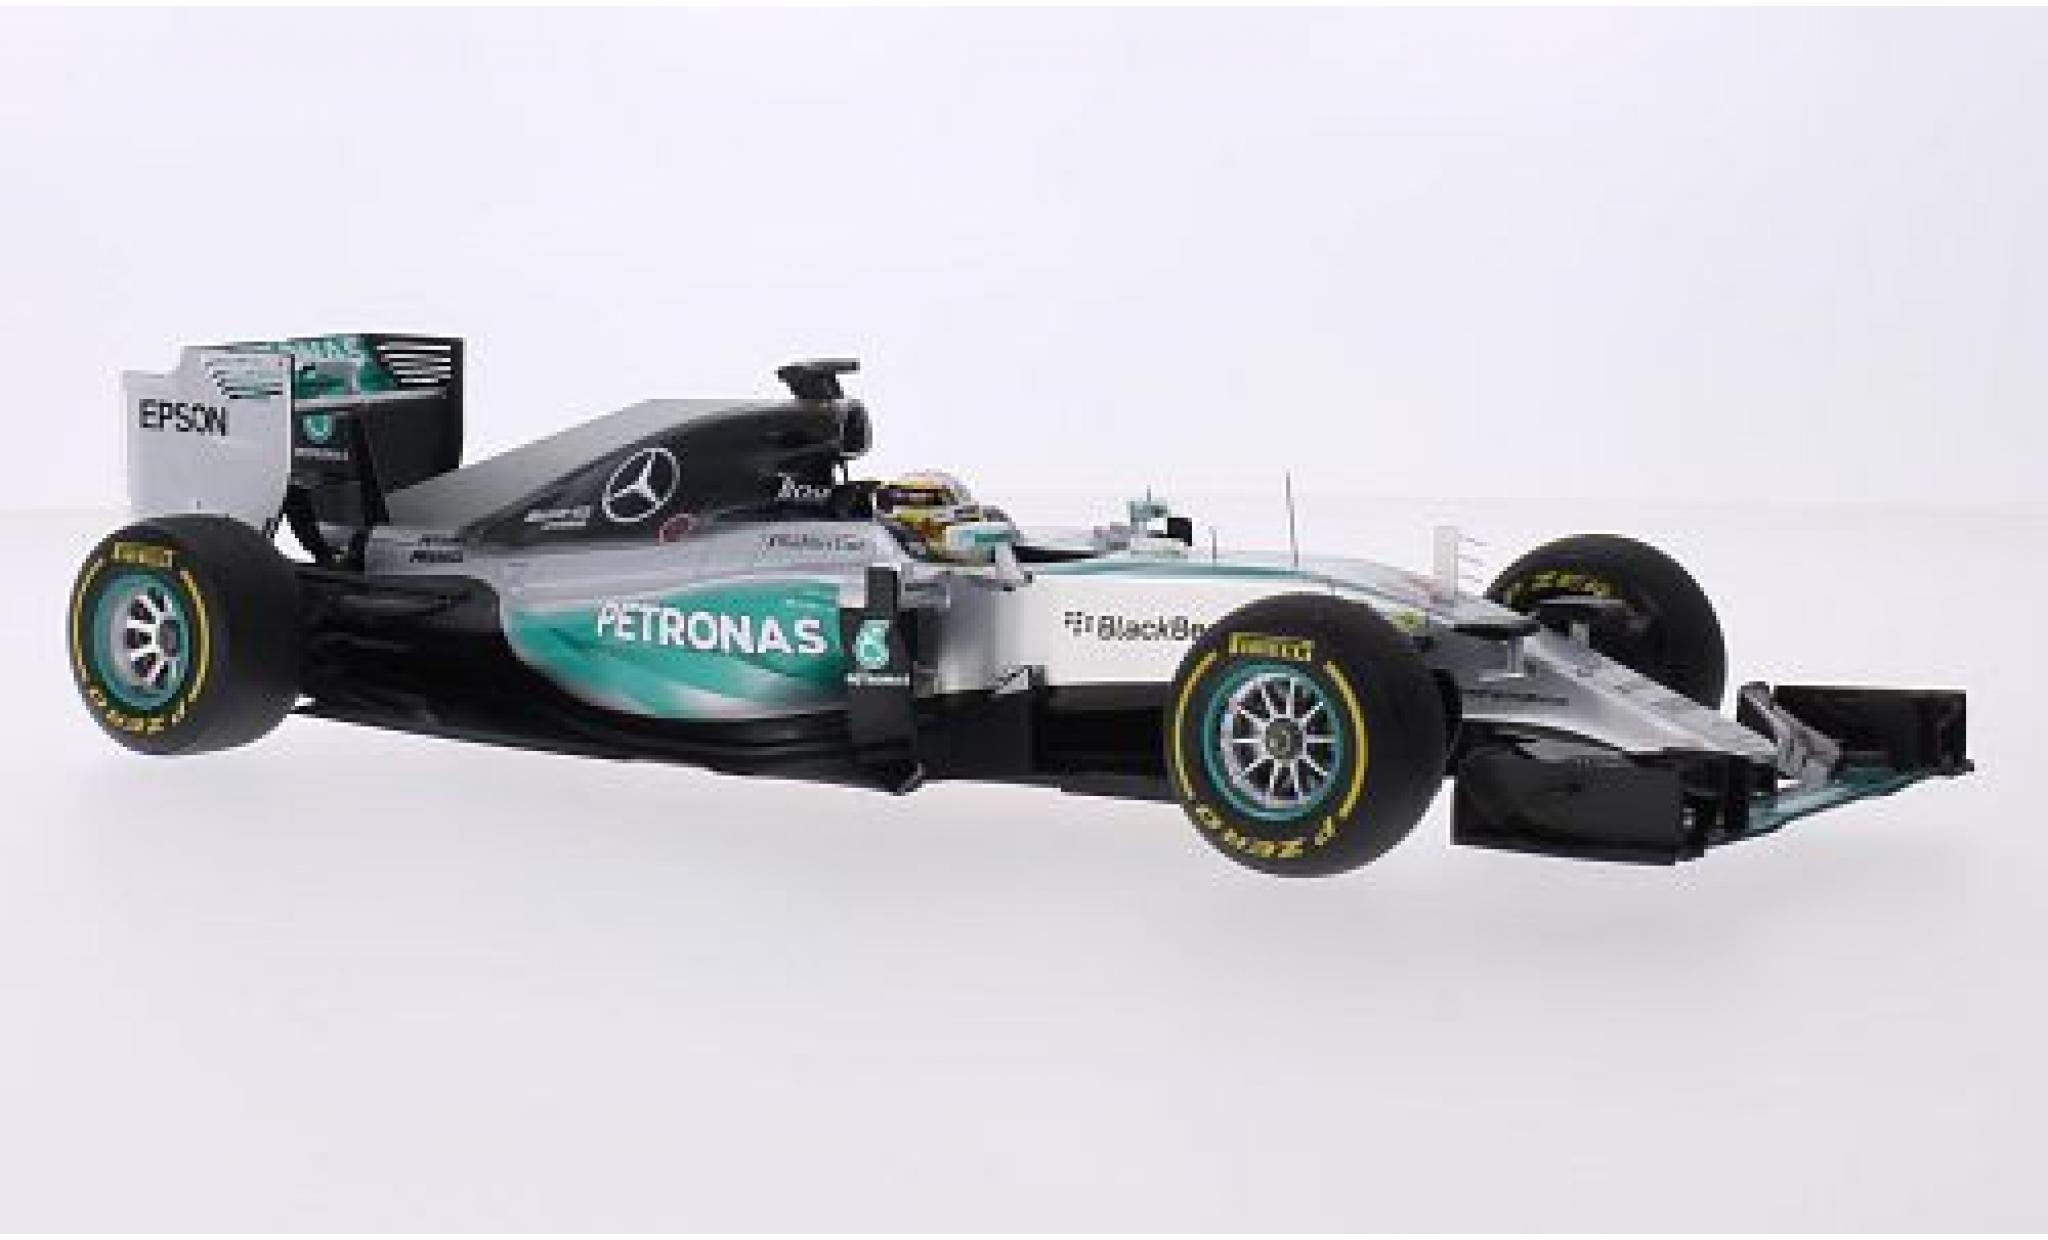 Mercedes F1 1/18 Spark W06 Hybrid No.44 AMG Petronas Formula One Team Petronas Formel 1 GP USA 2015 y compris les Hinblanchechild L.Hamilton